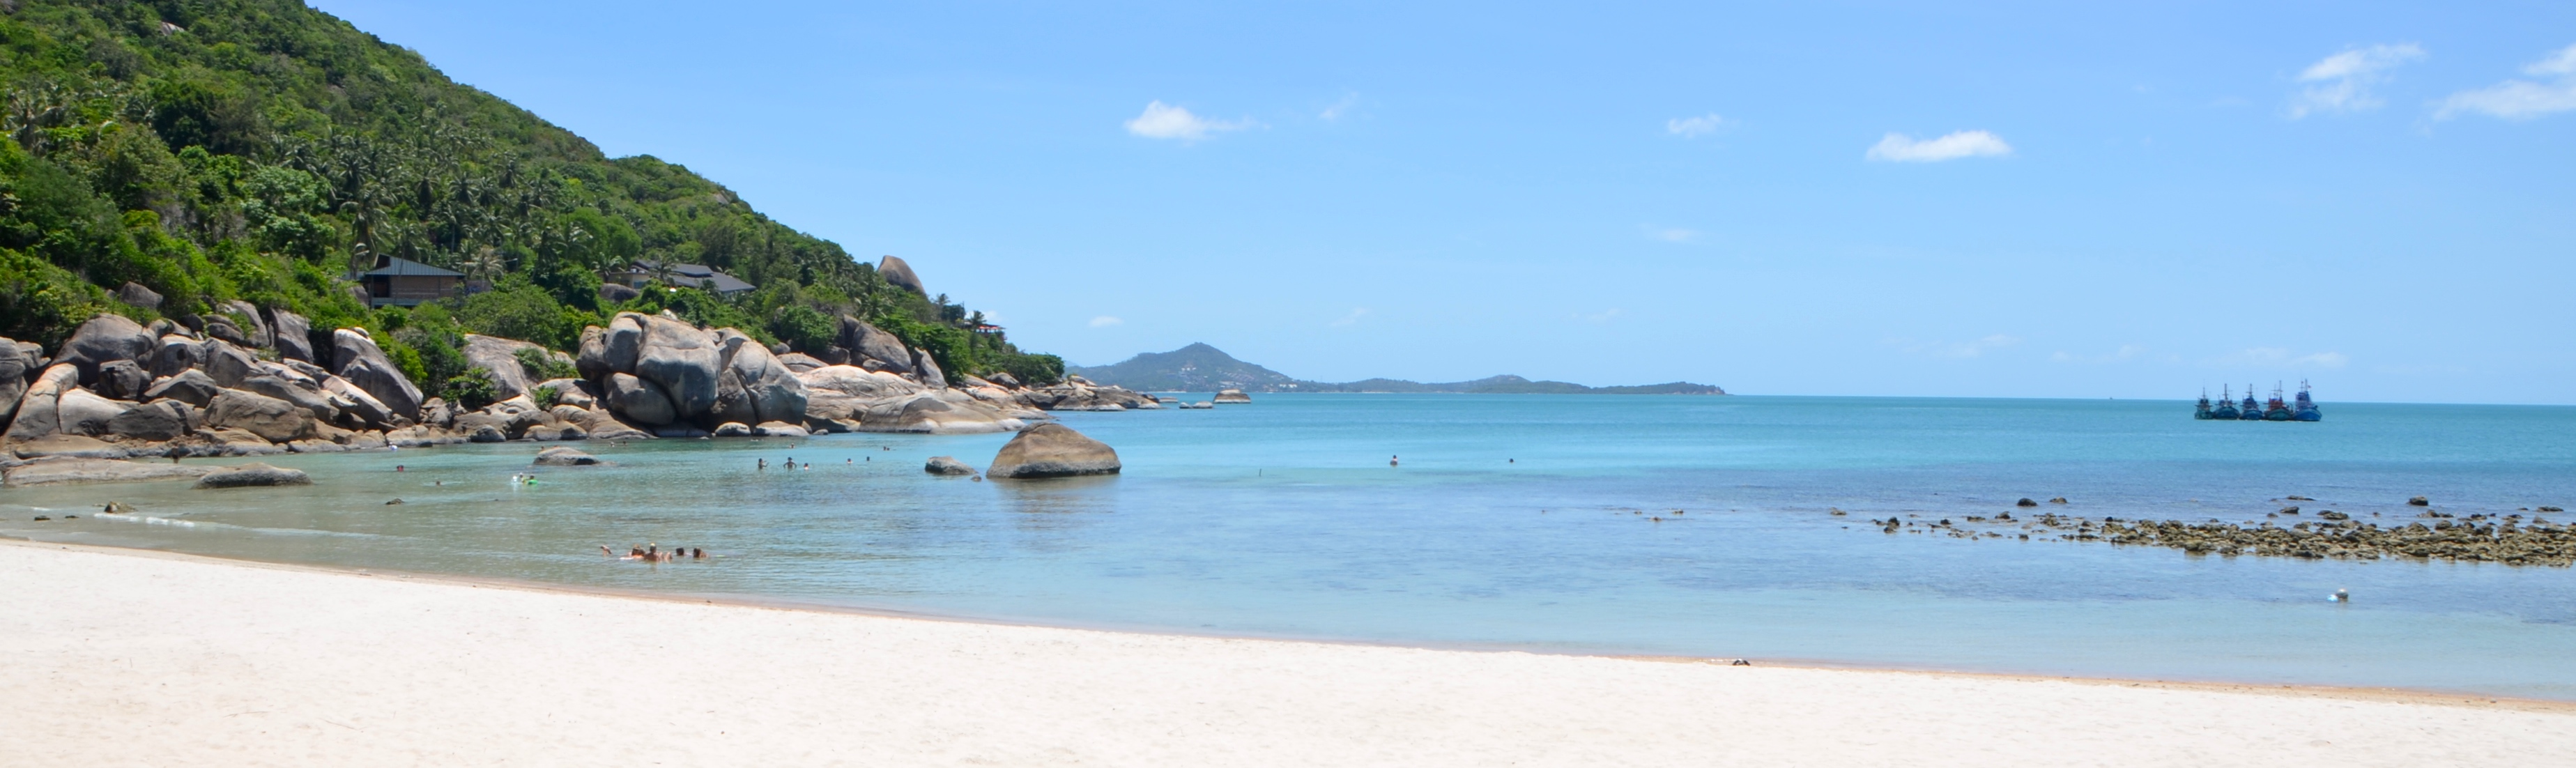 Tailandia_Koh Samui_Cristal Bay